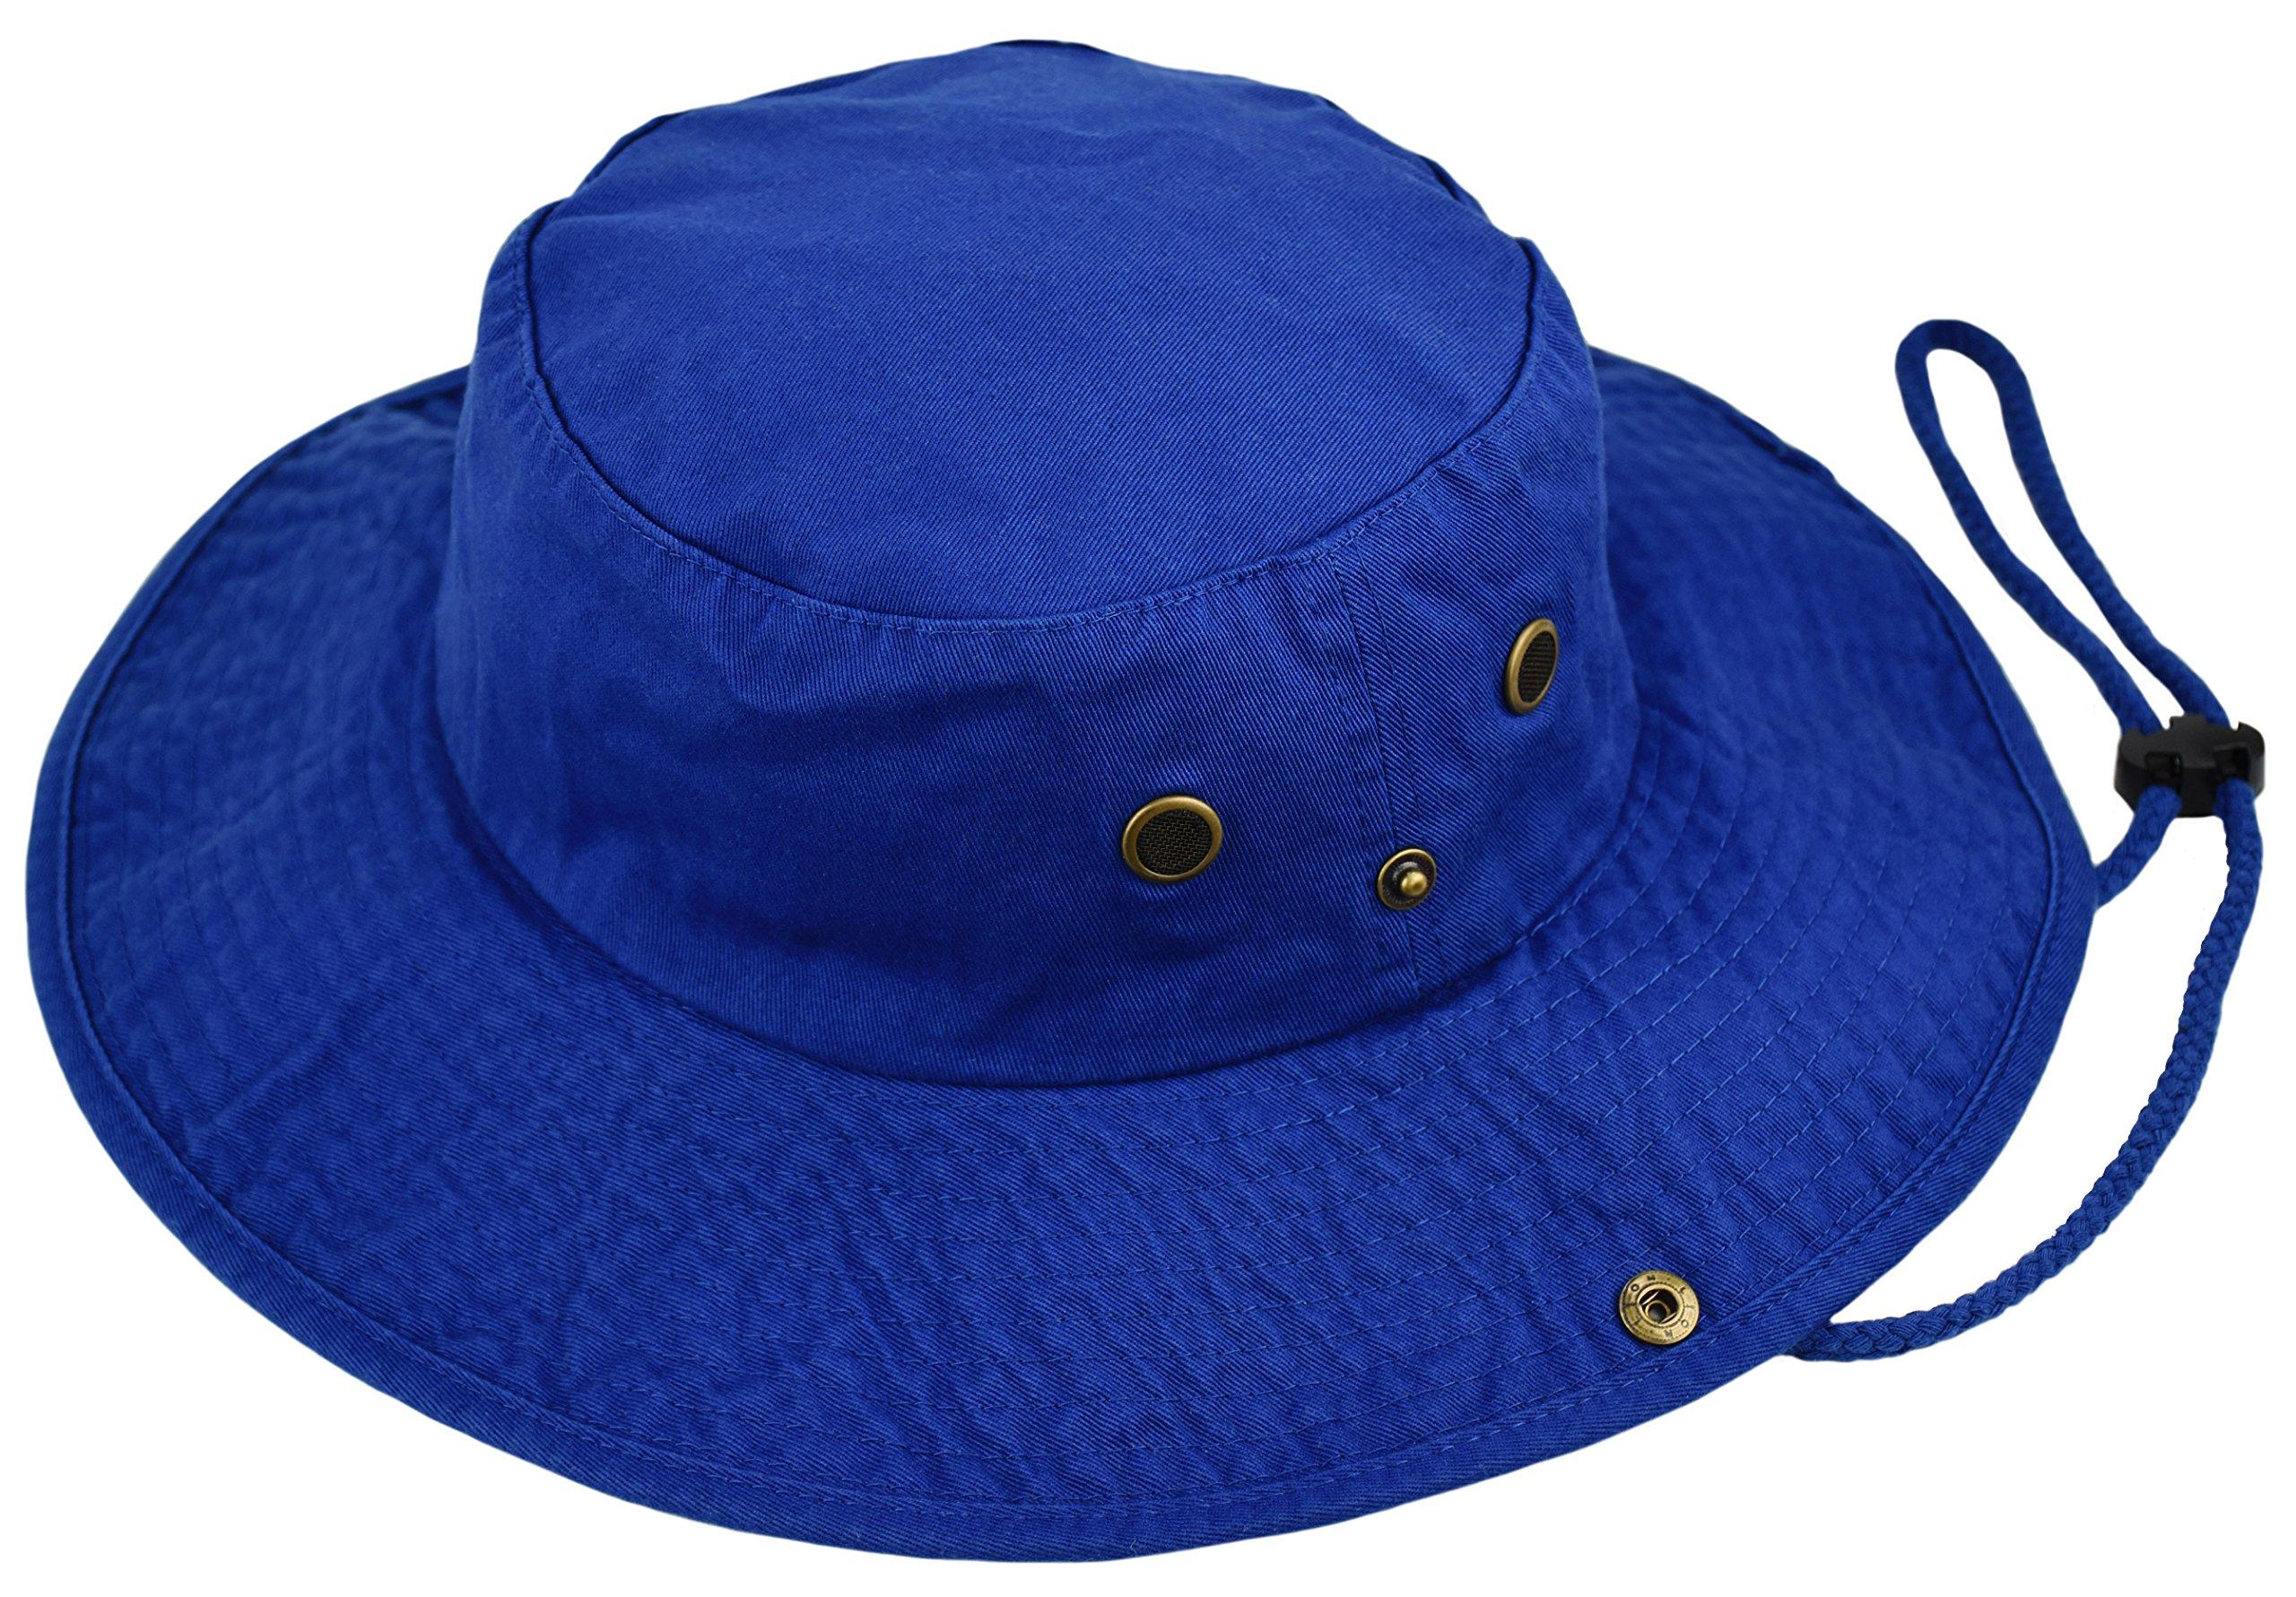 Deewang Summer Bucket Cap, Sun Hat With Adjustable CHINSTRAP, Outdoor Hunting Fishing Safari boonie Hat (Royal-Blue, Small/Medium)